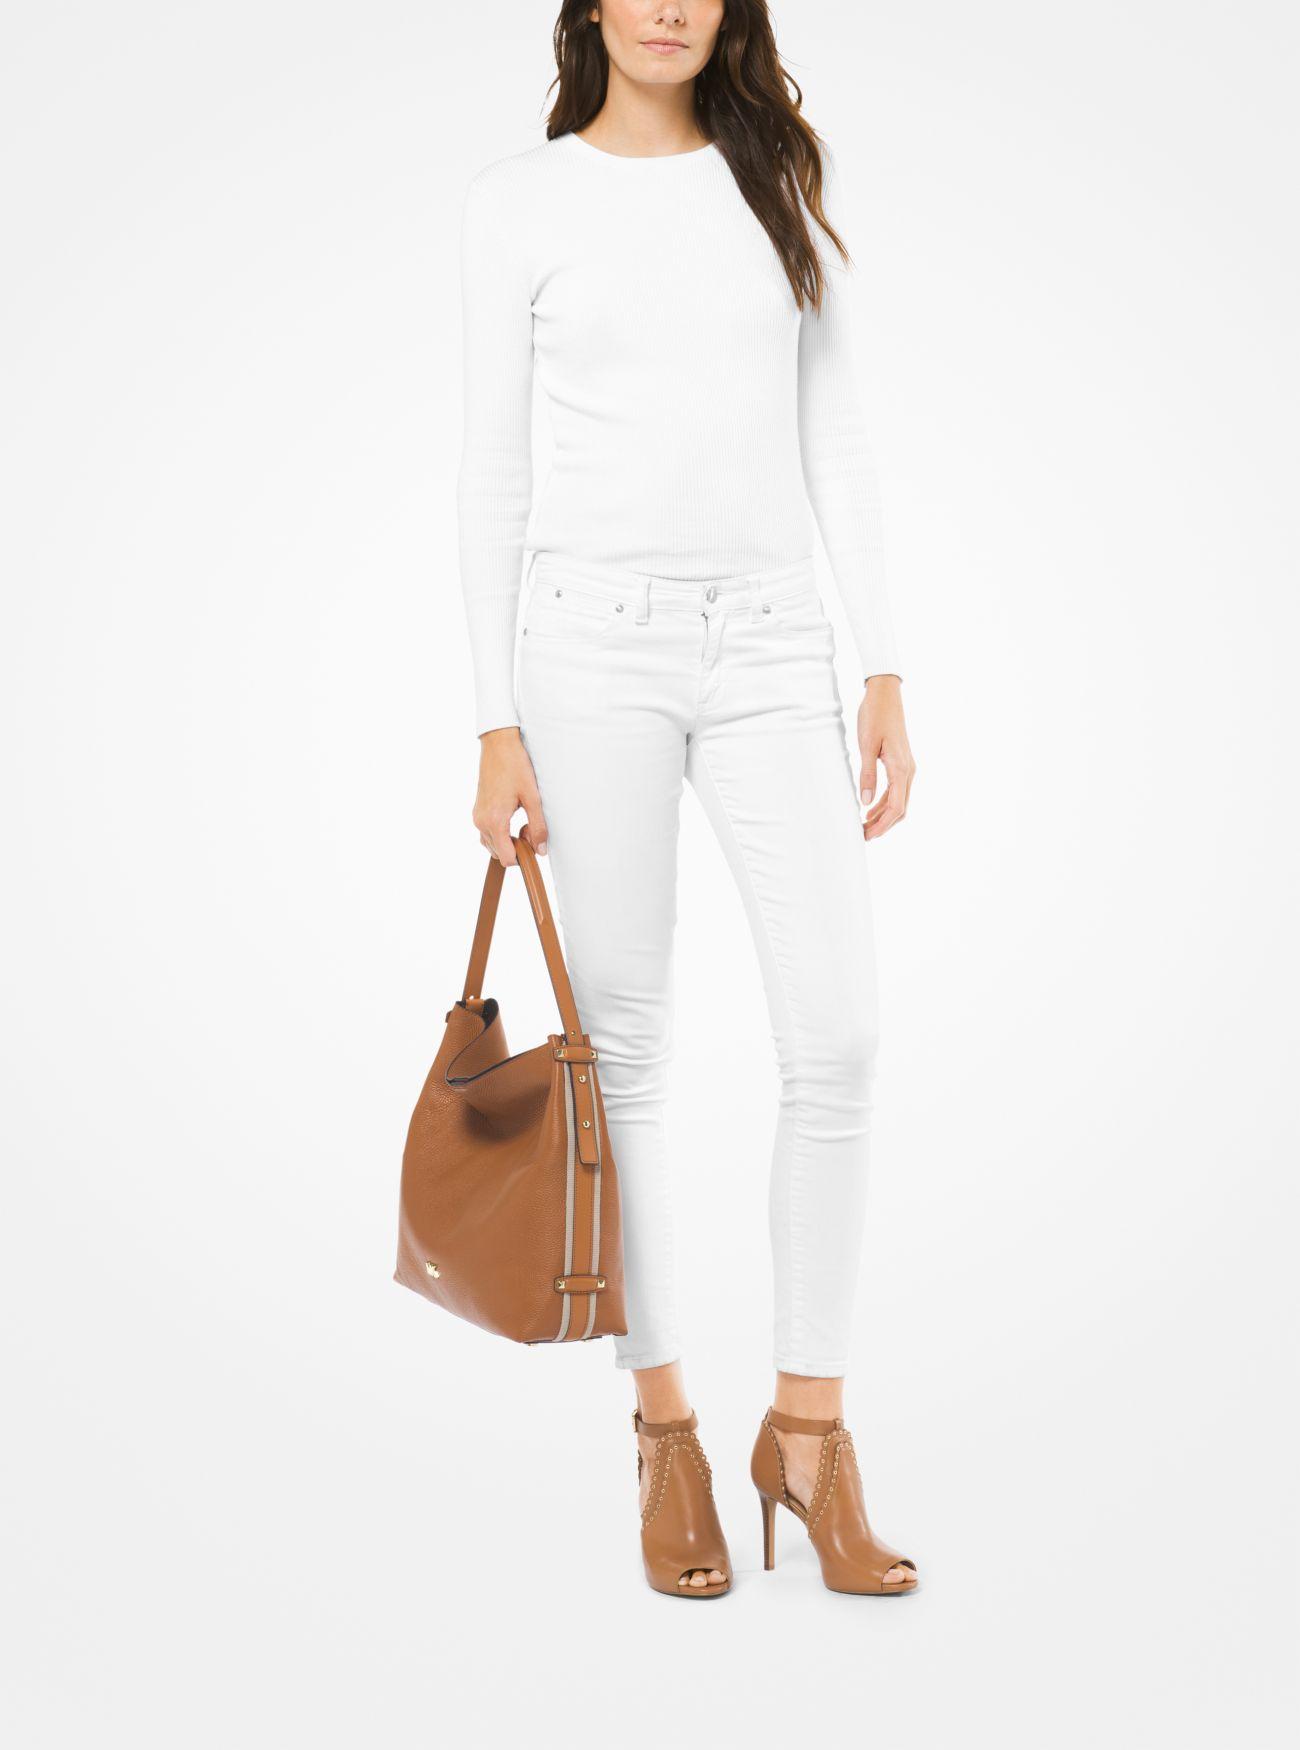 2d90ec06b8f9 ... Griffin Large Leather Shoulder Bag. MICHAEL Michael Kors